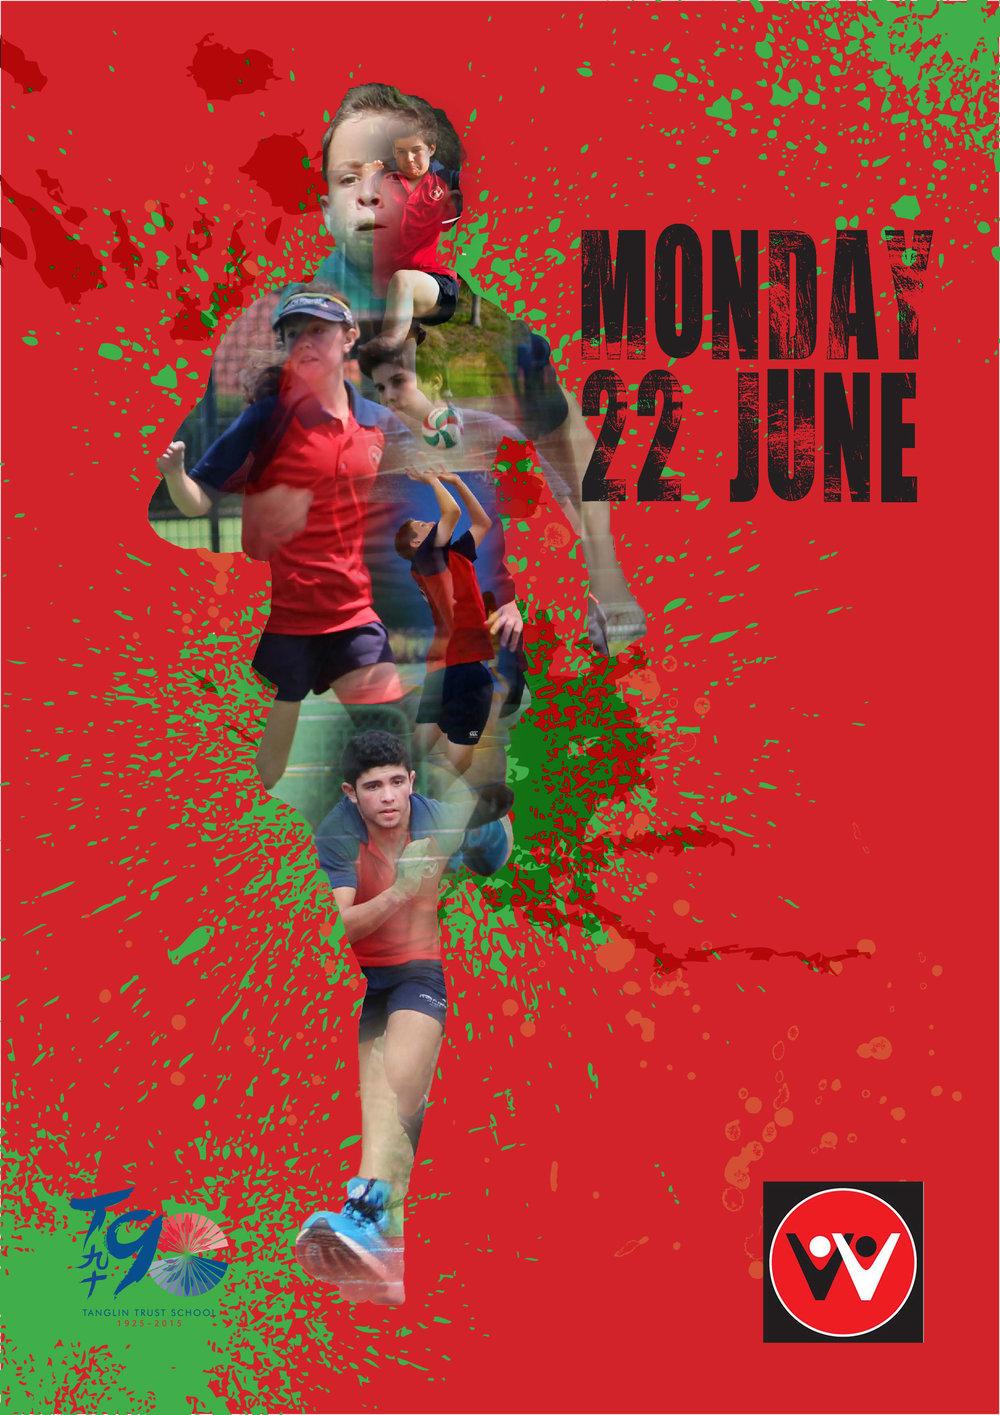 Sports Day Poster 4.jpg